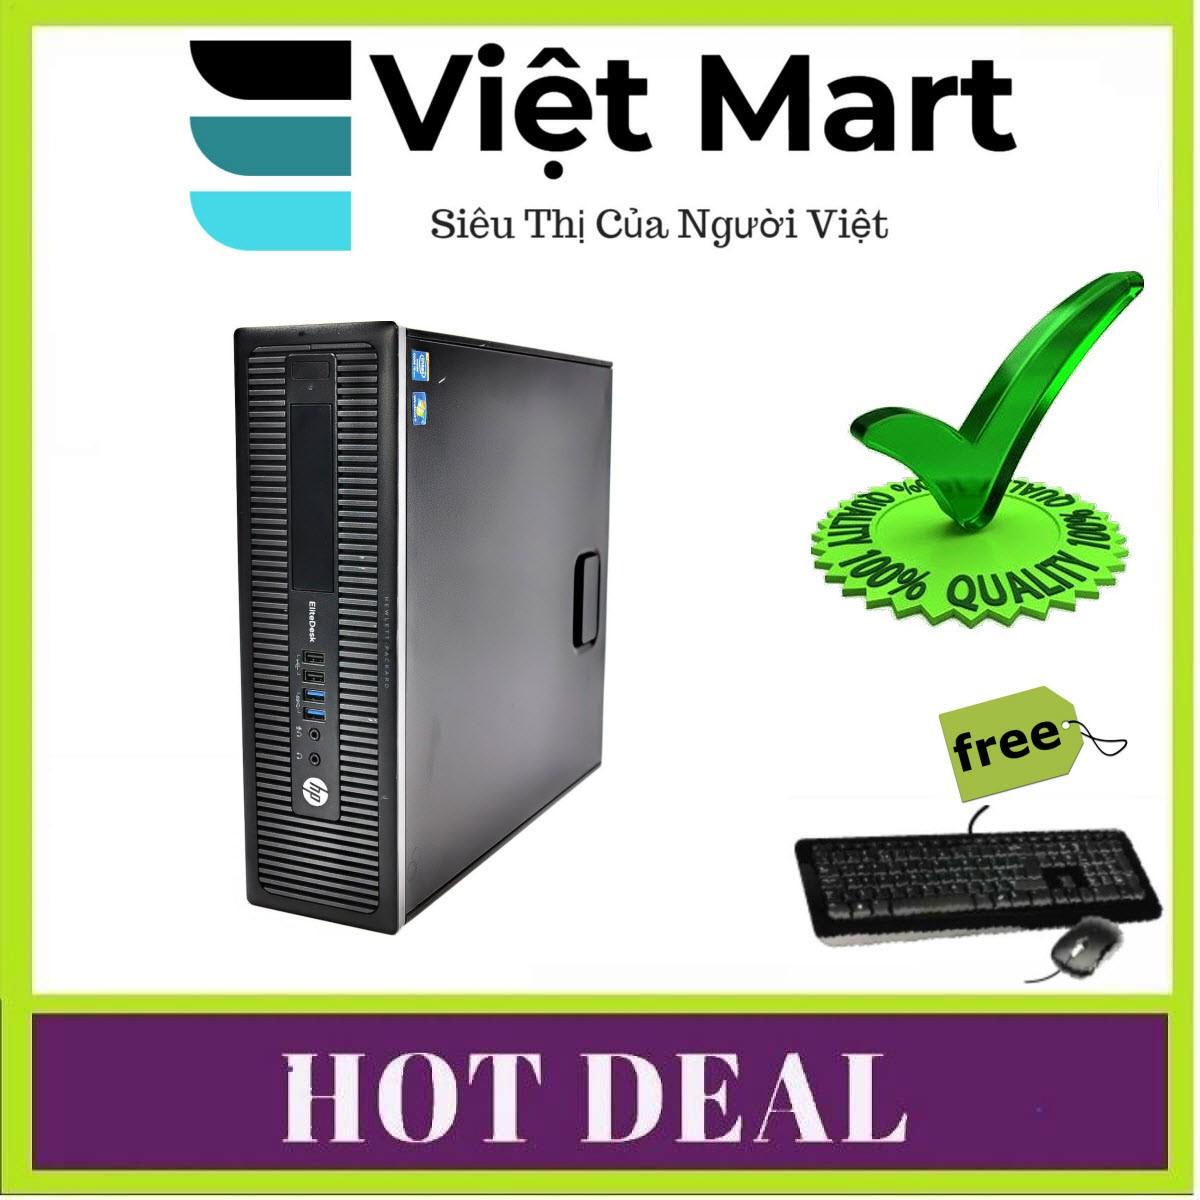 HP ELITE DESK 800 G1 ULTRA SLIM PC I5 4460S - RAM 4GB - HDD 500GB